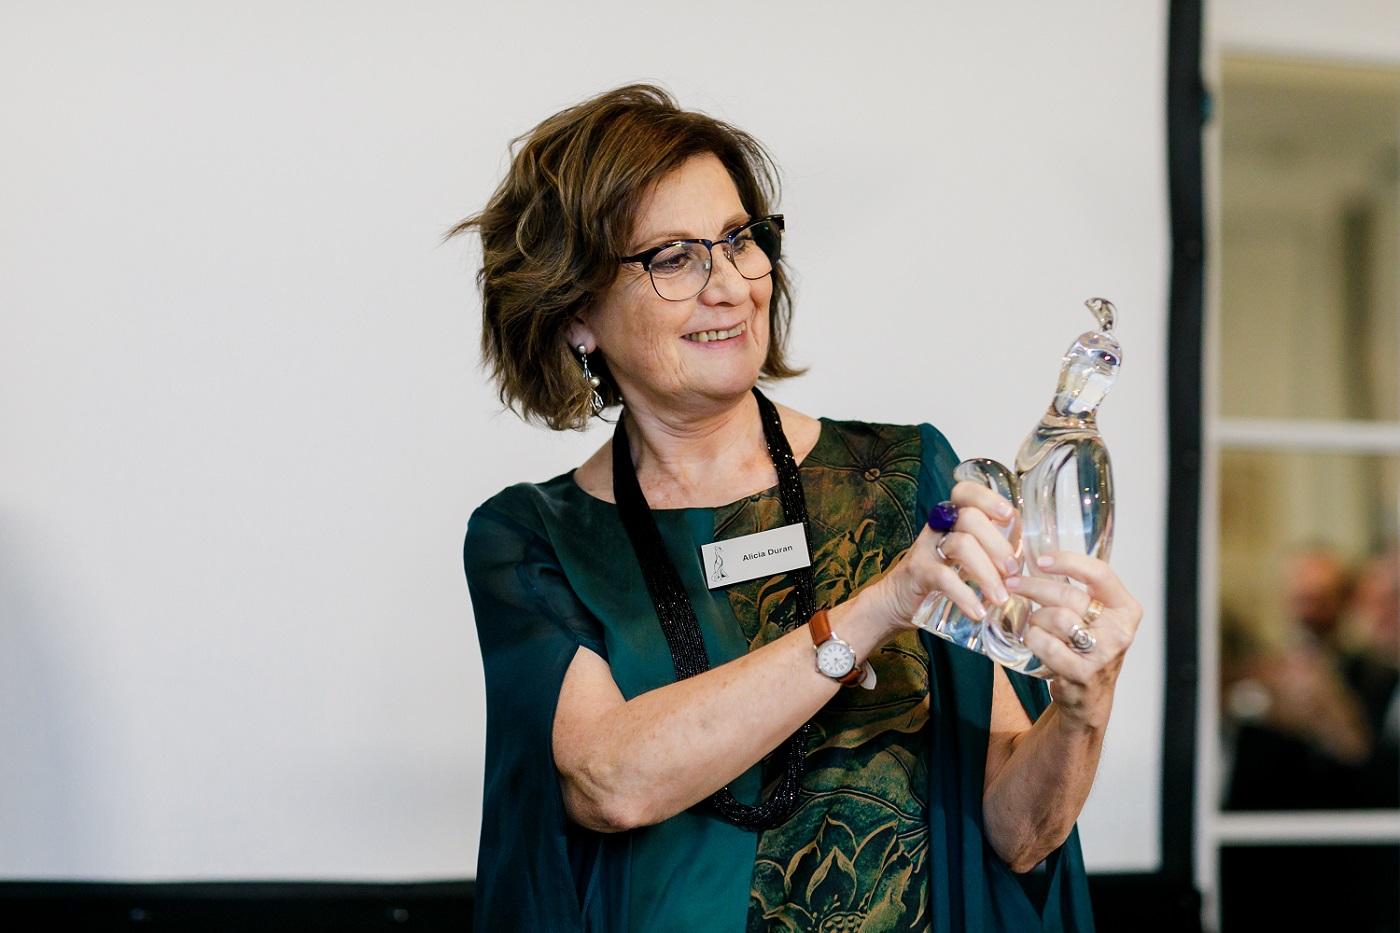 Alicia Durán recibe el Phoenix Award que premia a la Glass Person of the year 2019